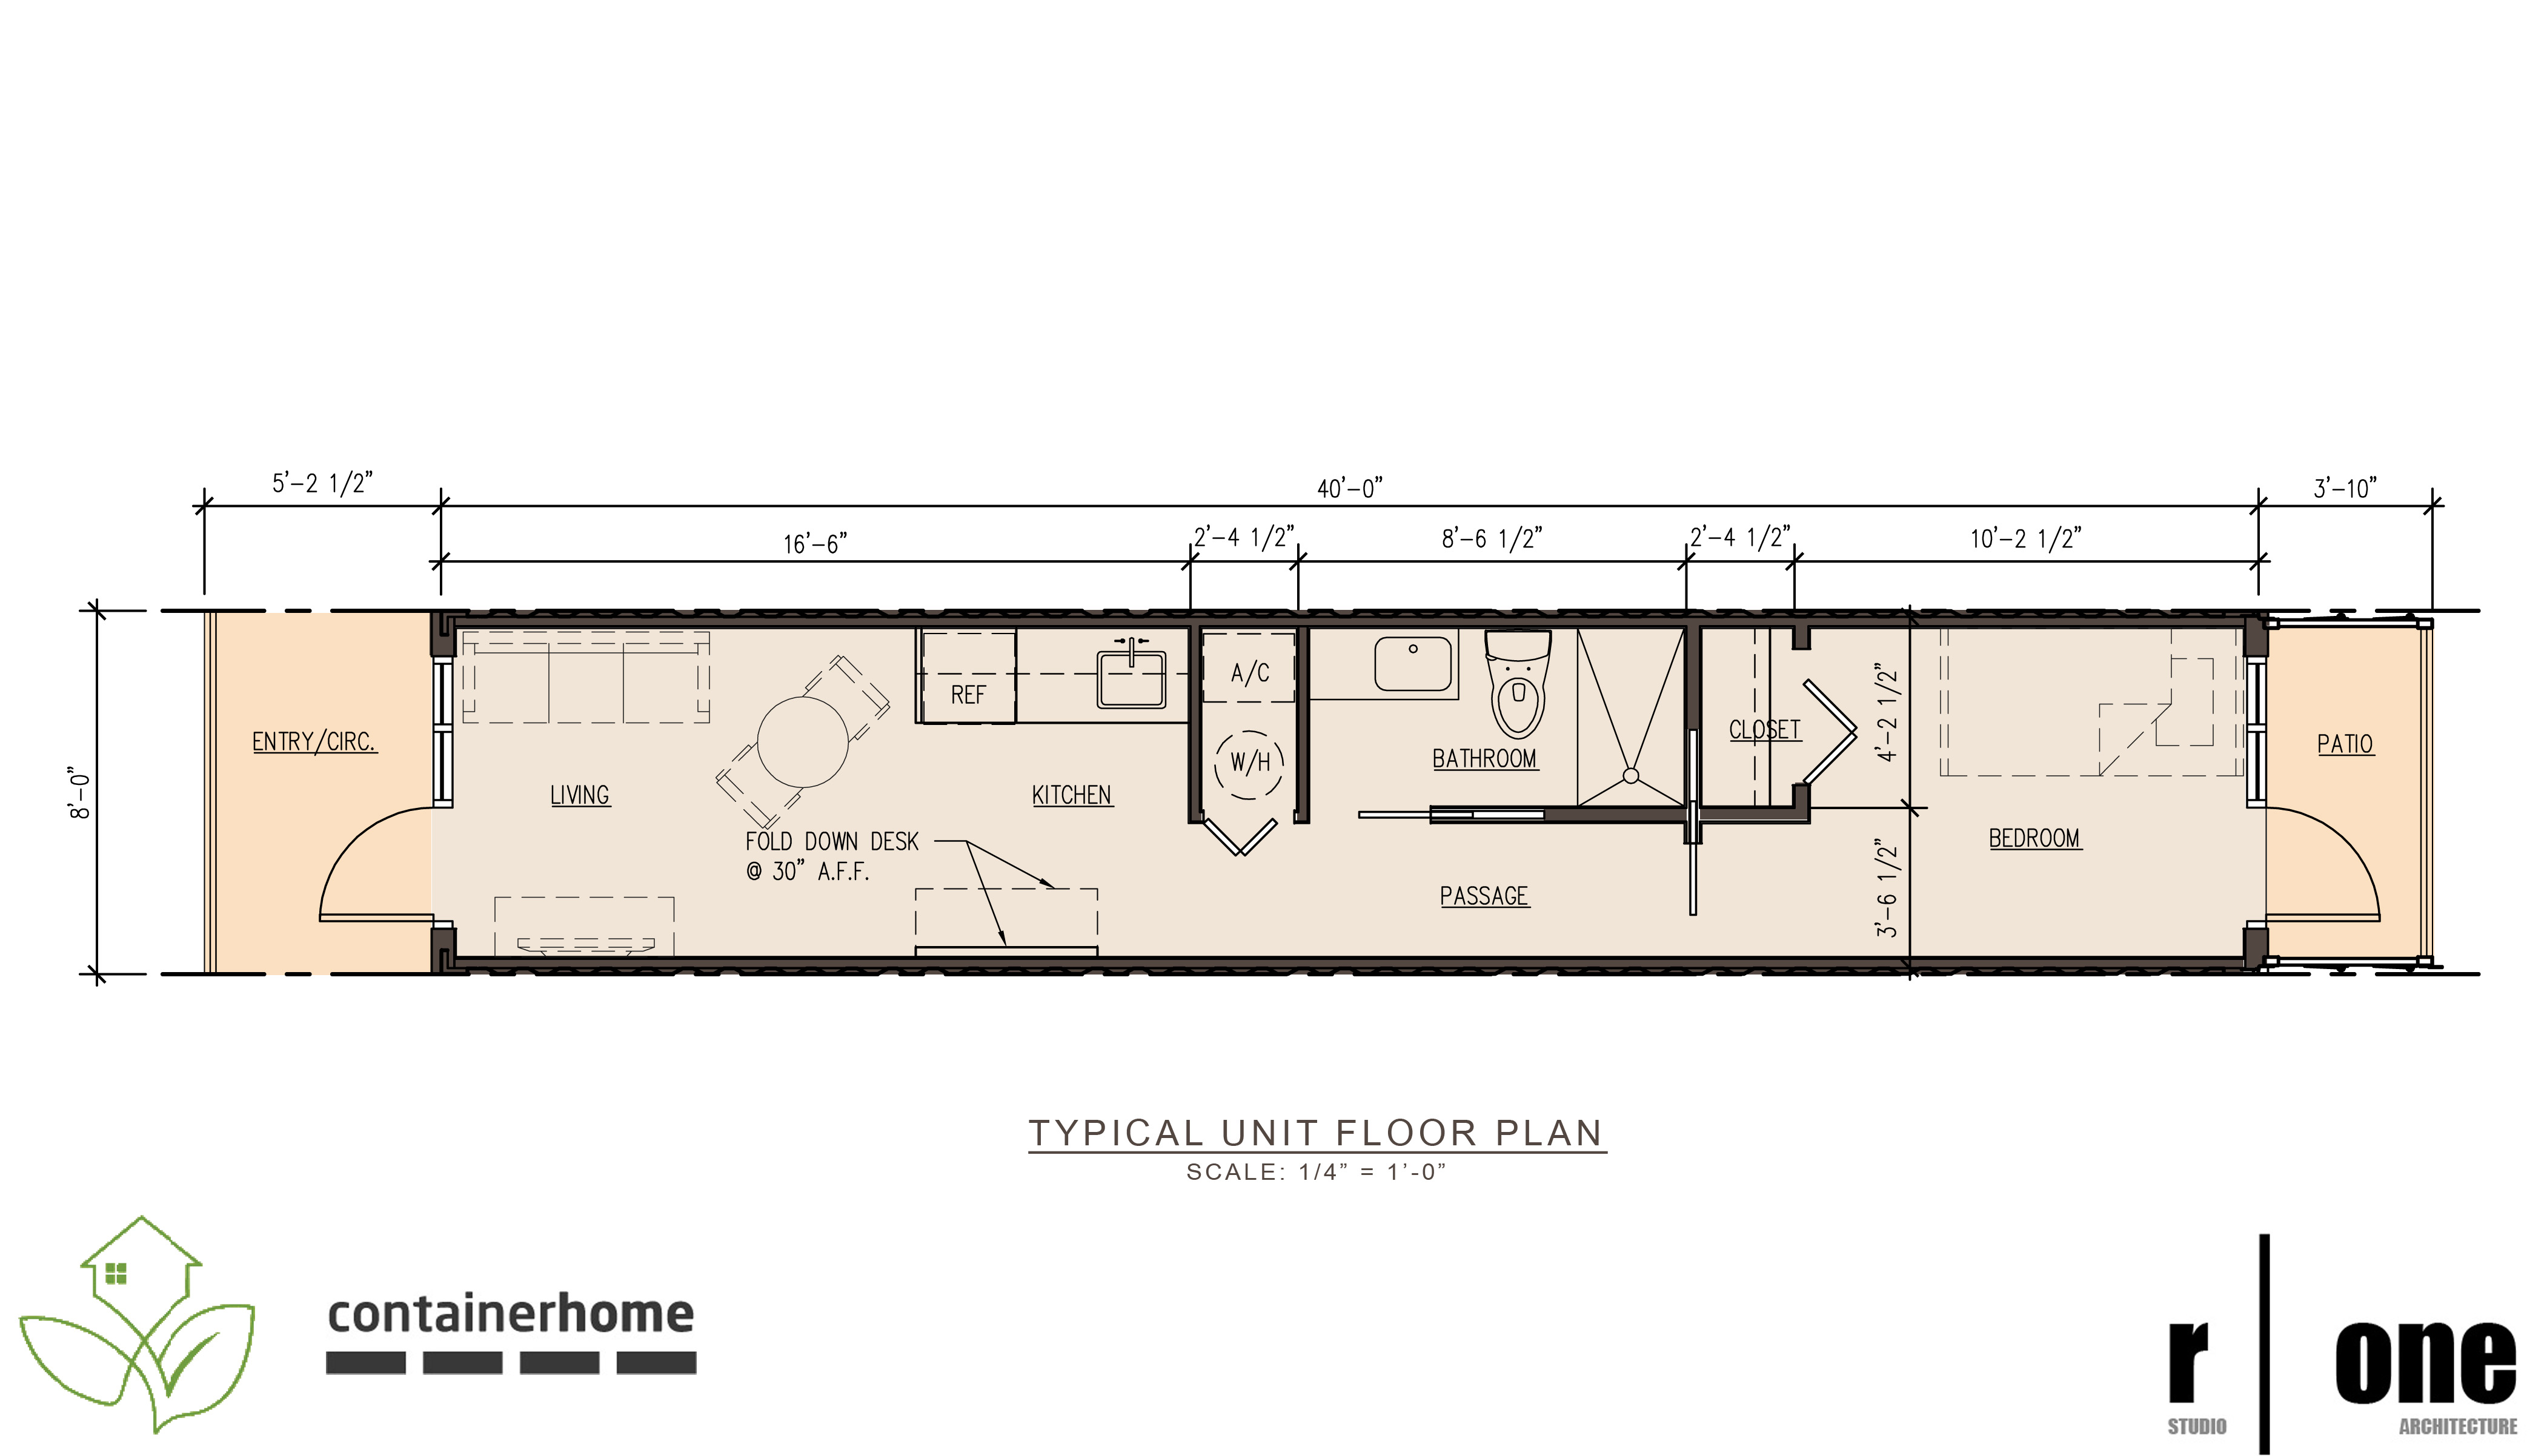 July 2011 r one studio architecture for Unit building plans